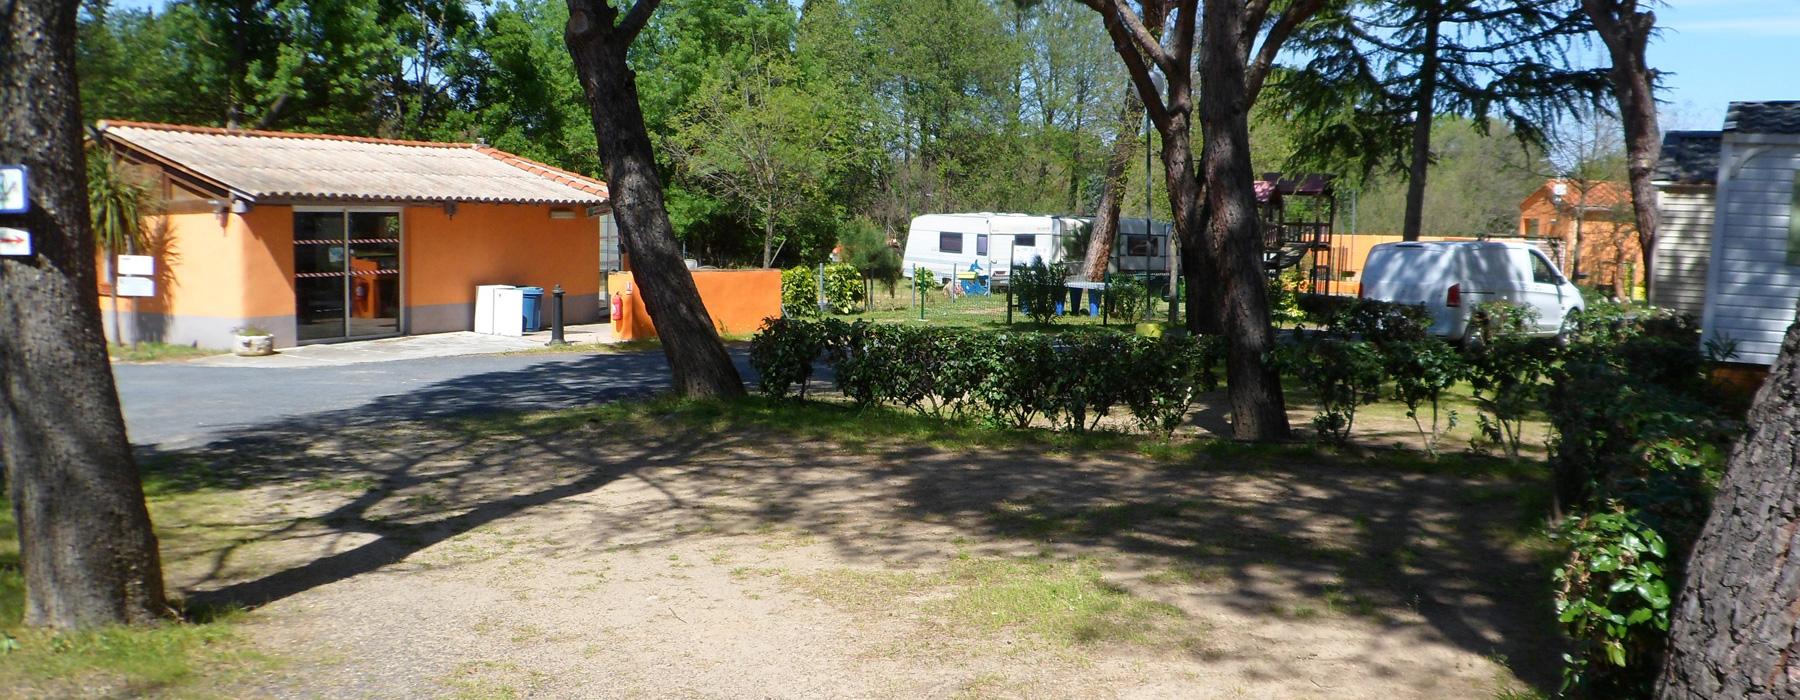 emplacement camping Pyrénées Orientales